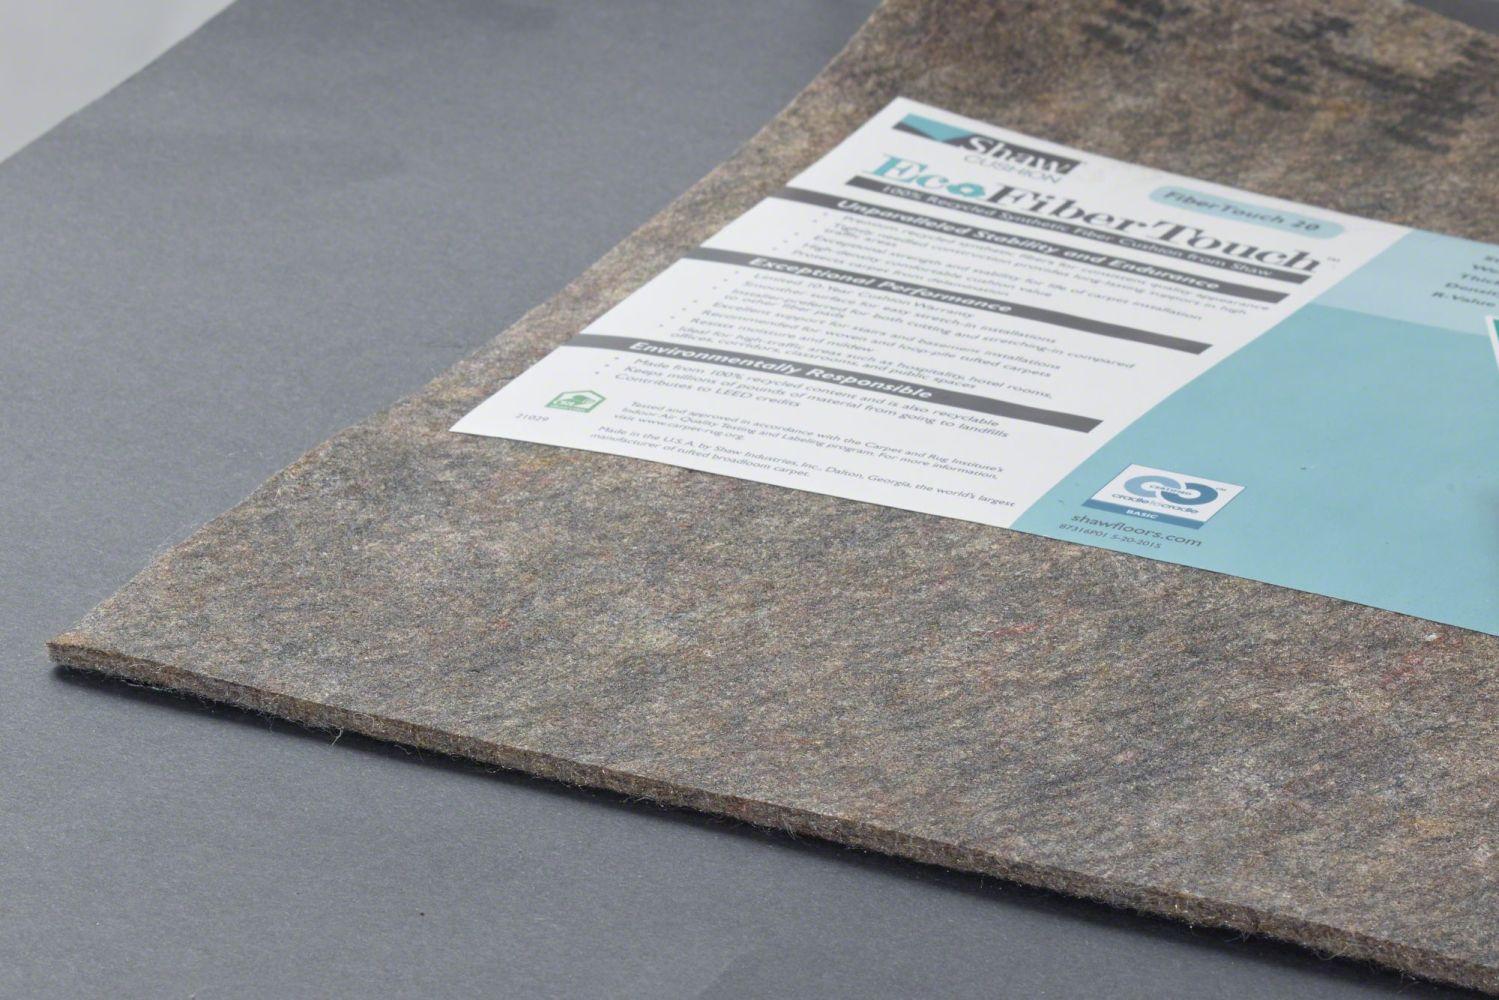 Shaw Floors Eco Edge Cushion Div3fibert20-6 Grey 00001_502PD